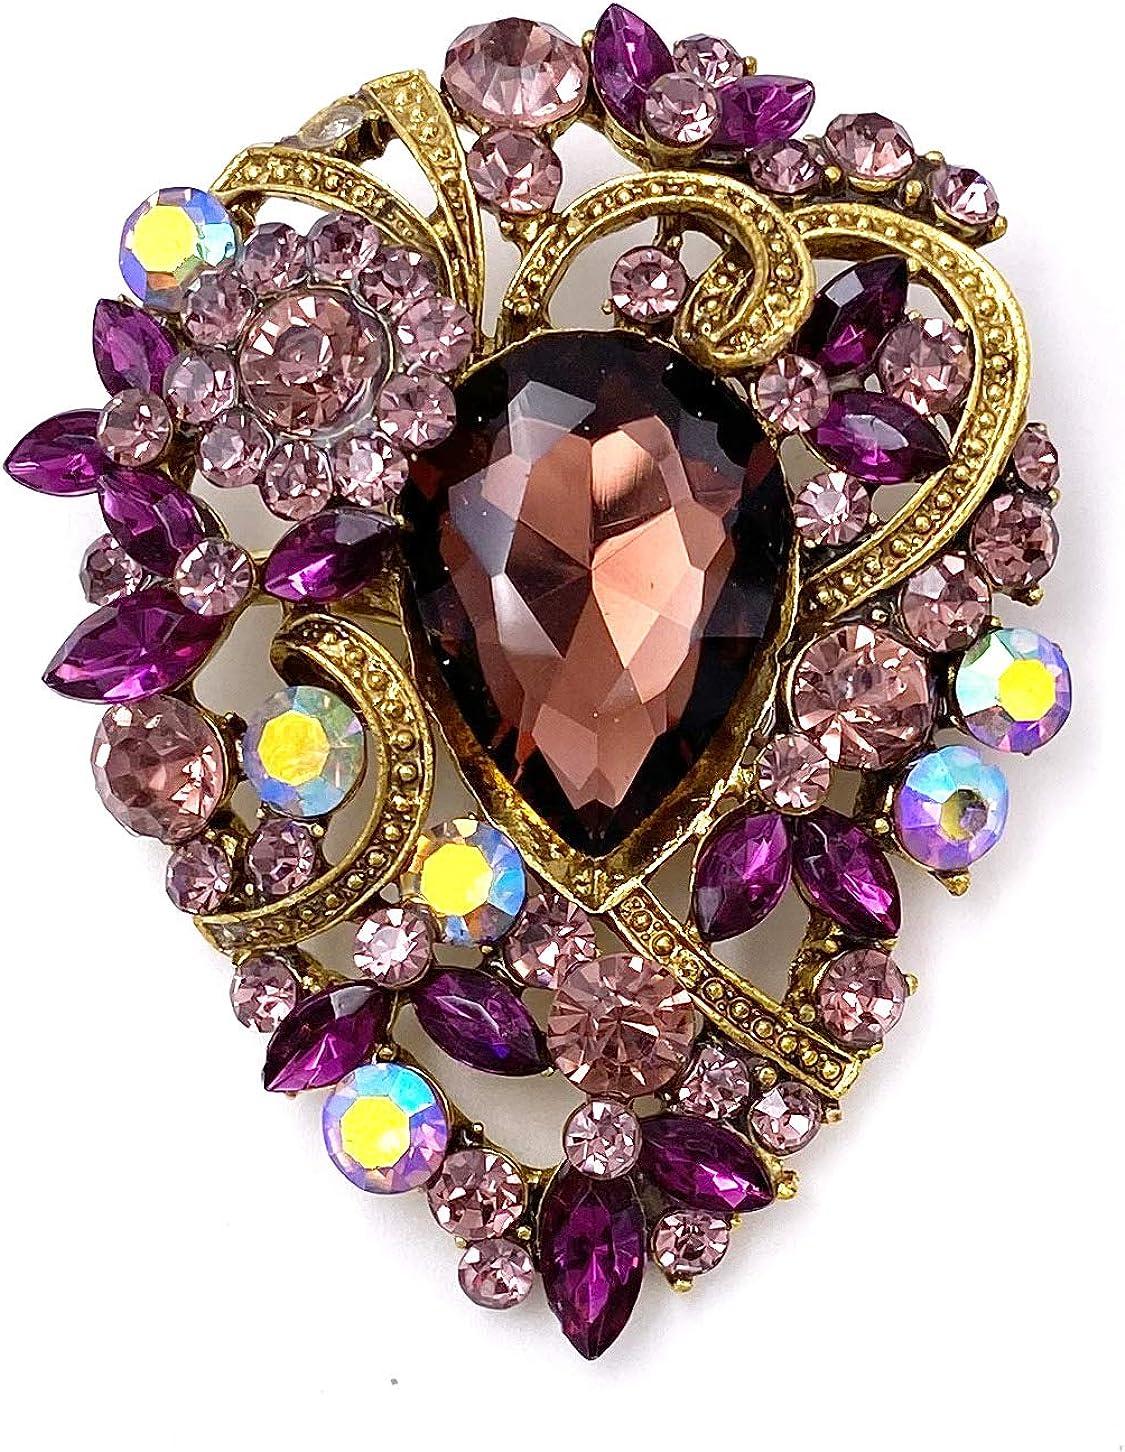 LAXPICOL Women's Vintage Austrian Crystal Elegant Flower Teardrop Brooch Gold Tone